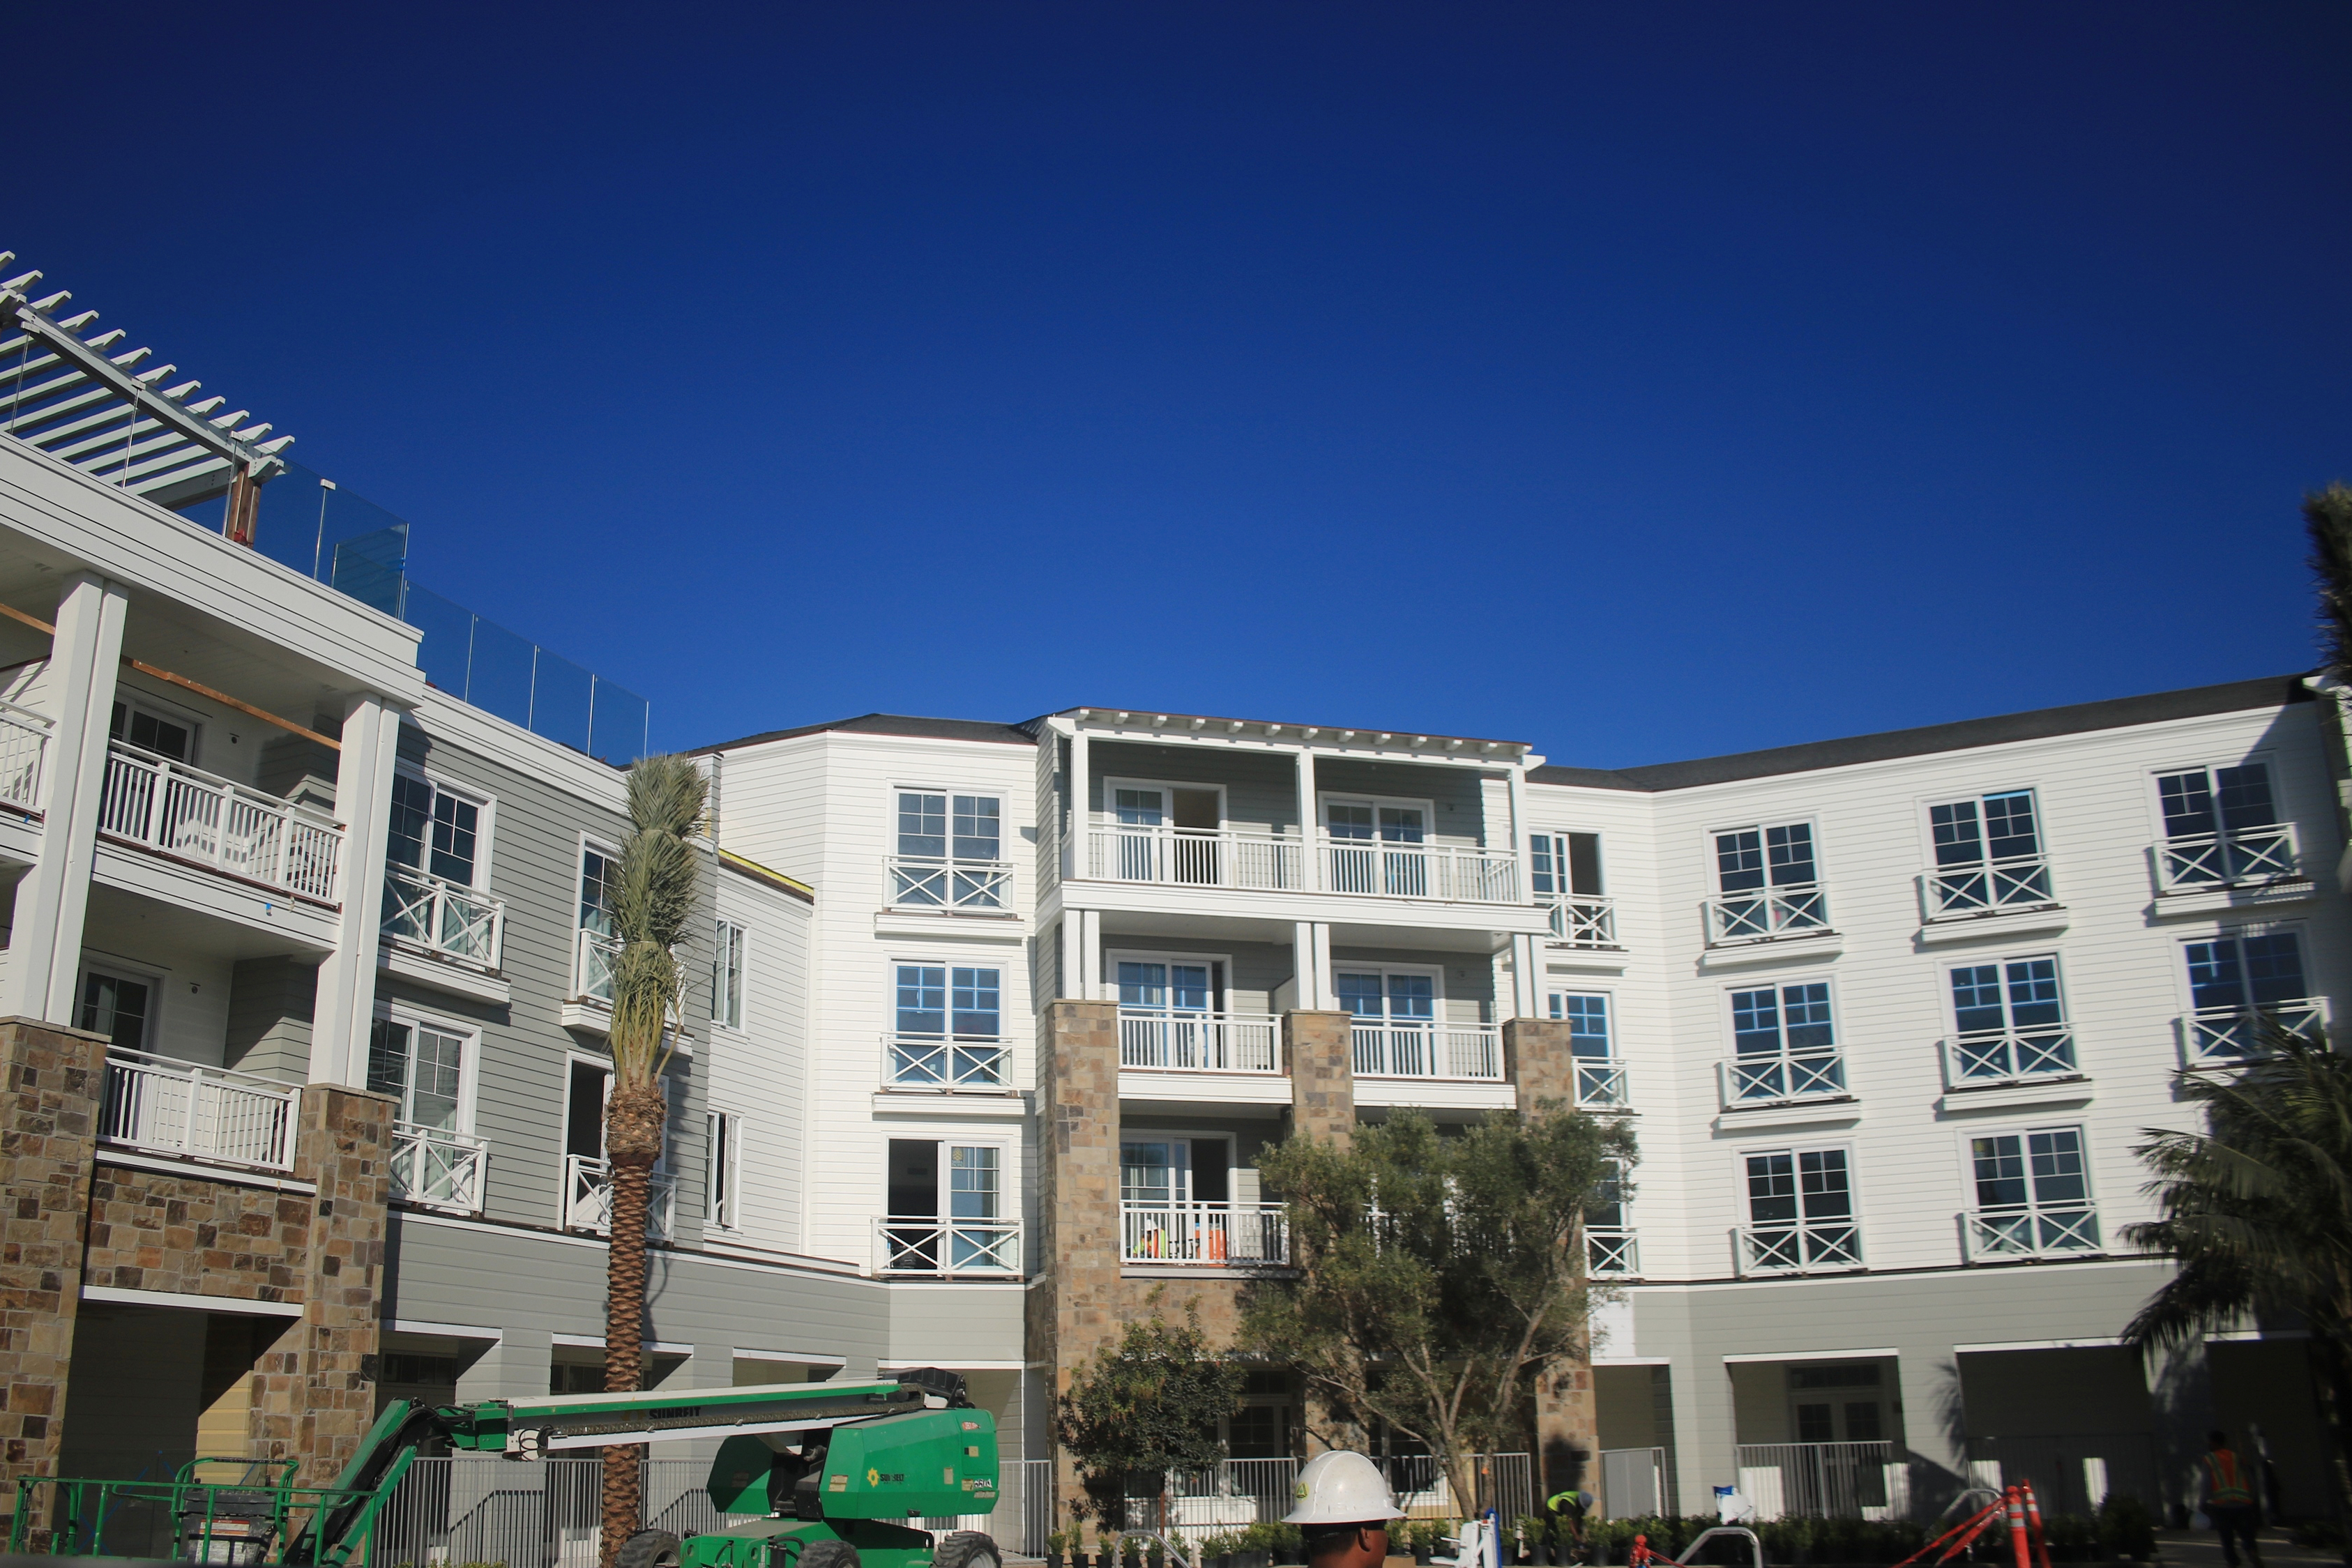 Balboa Peninsula Hotel Newport Beach